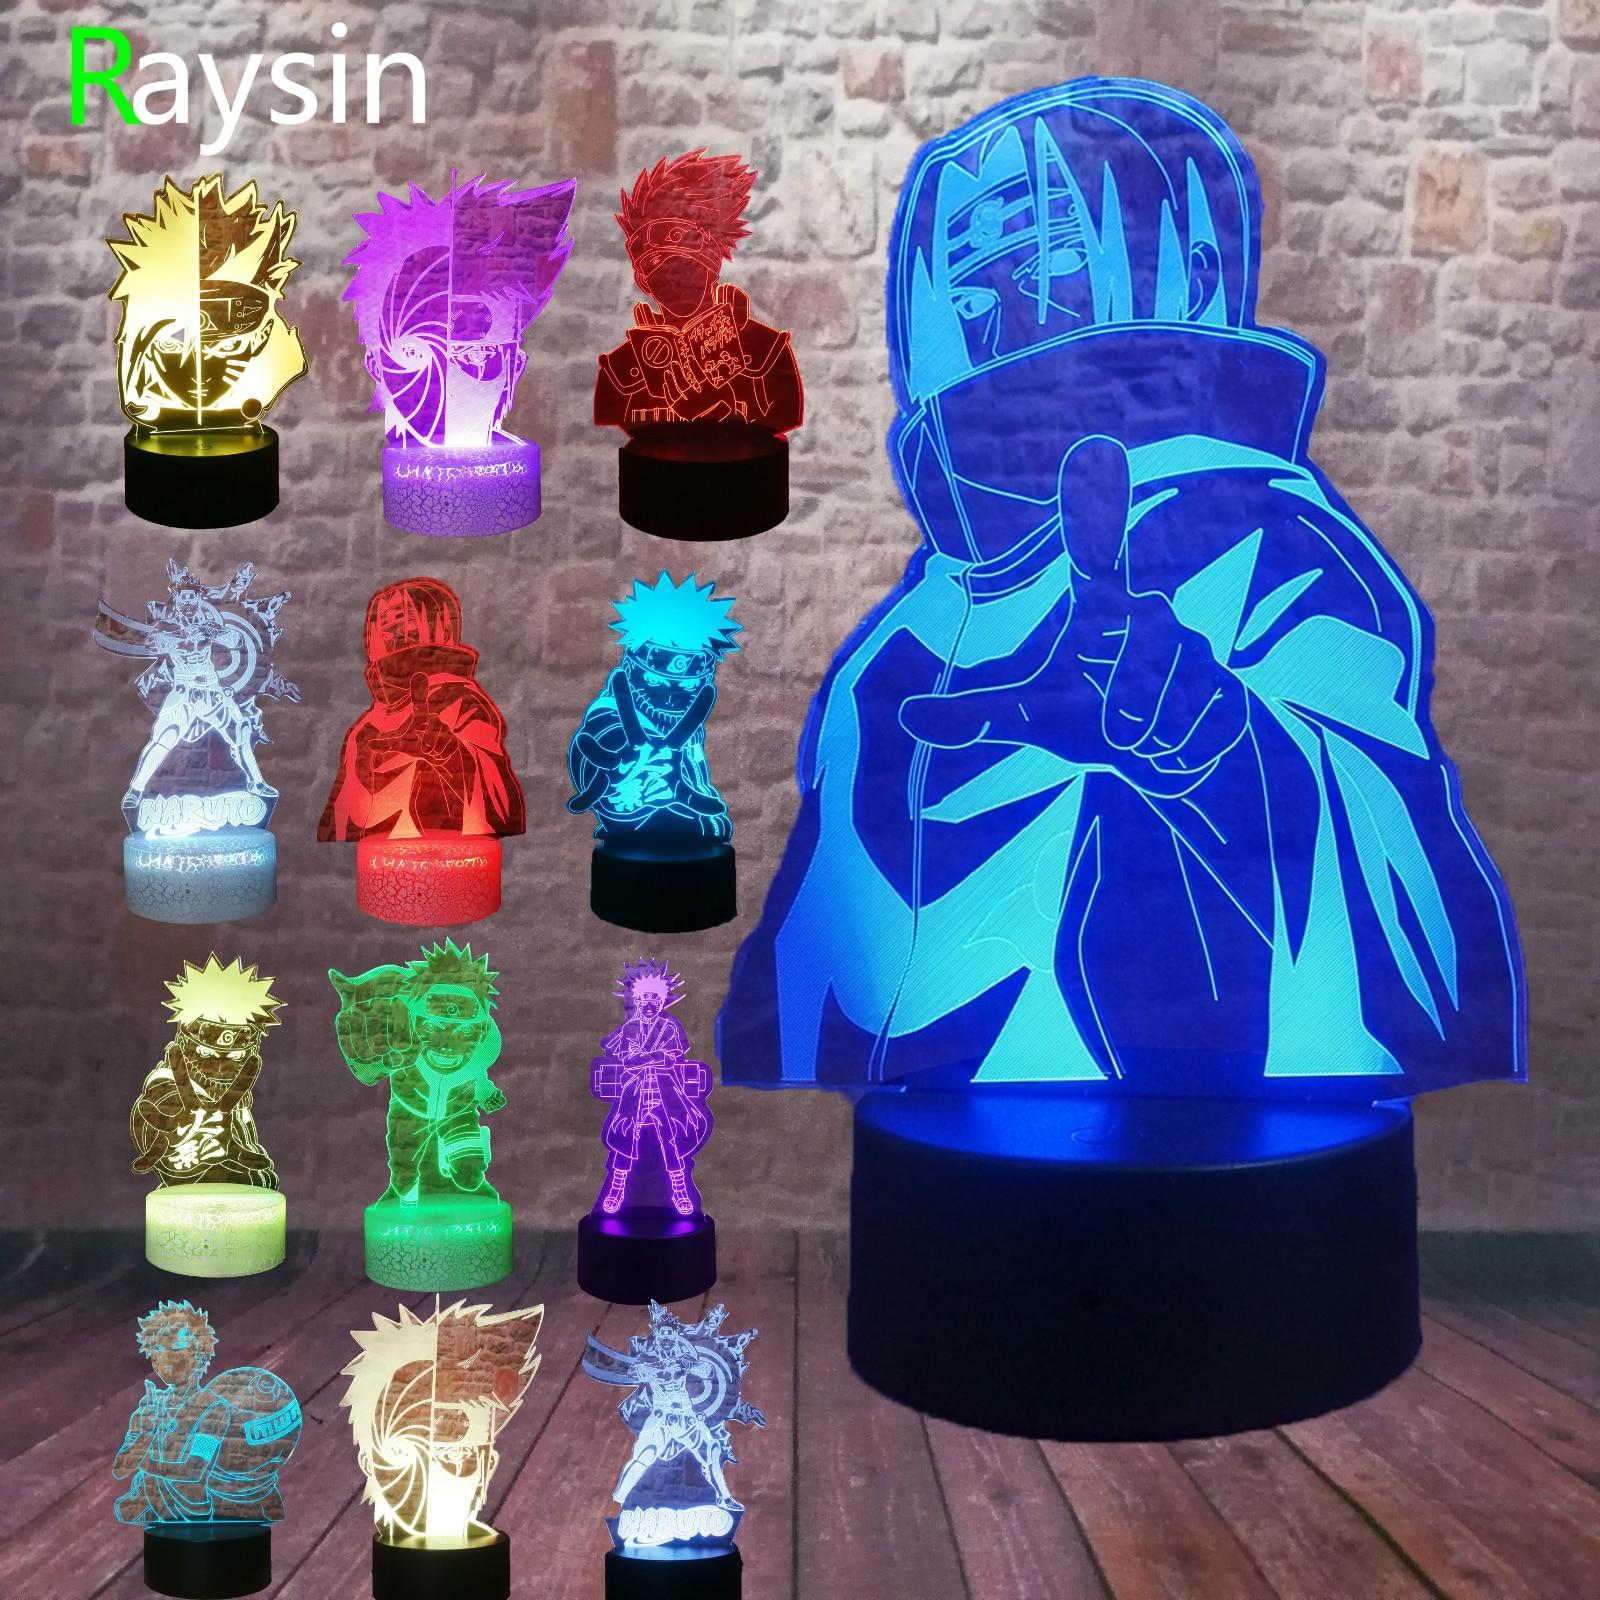 Naruto Kakashi Minato Uchiha Itachi Sasuke Night Light 7 Color Change Led Kids Bedside Action Figure 3D Child Boys Adults Gifts